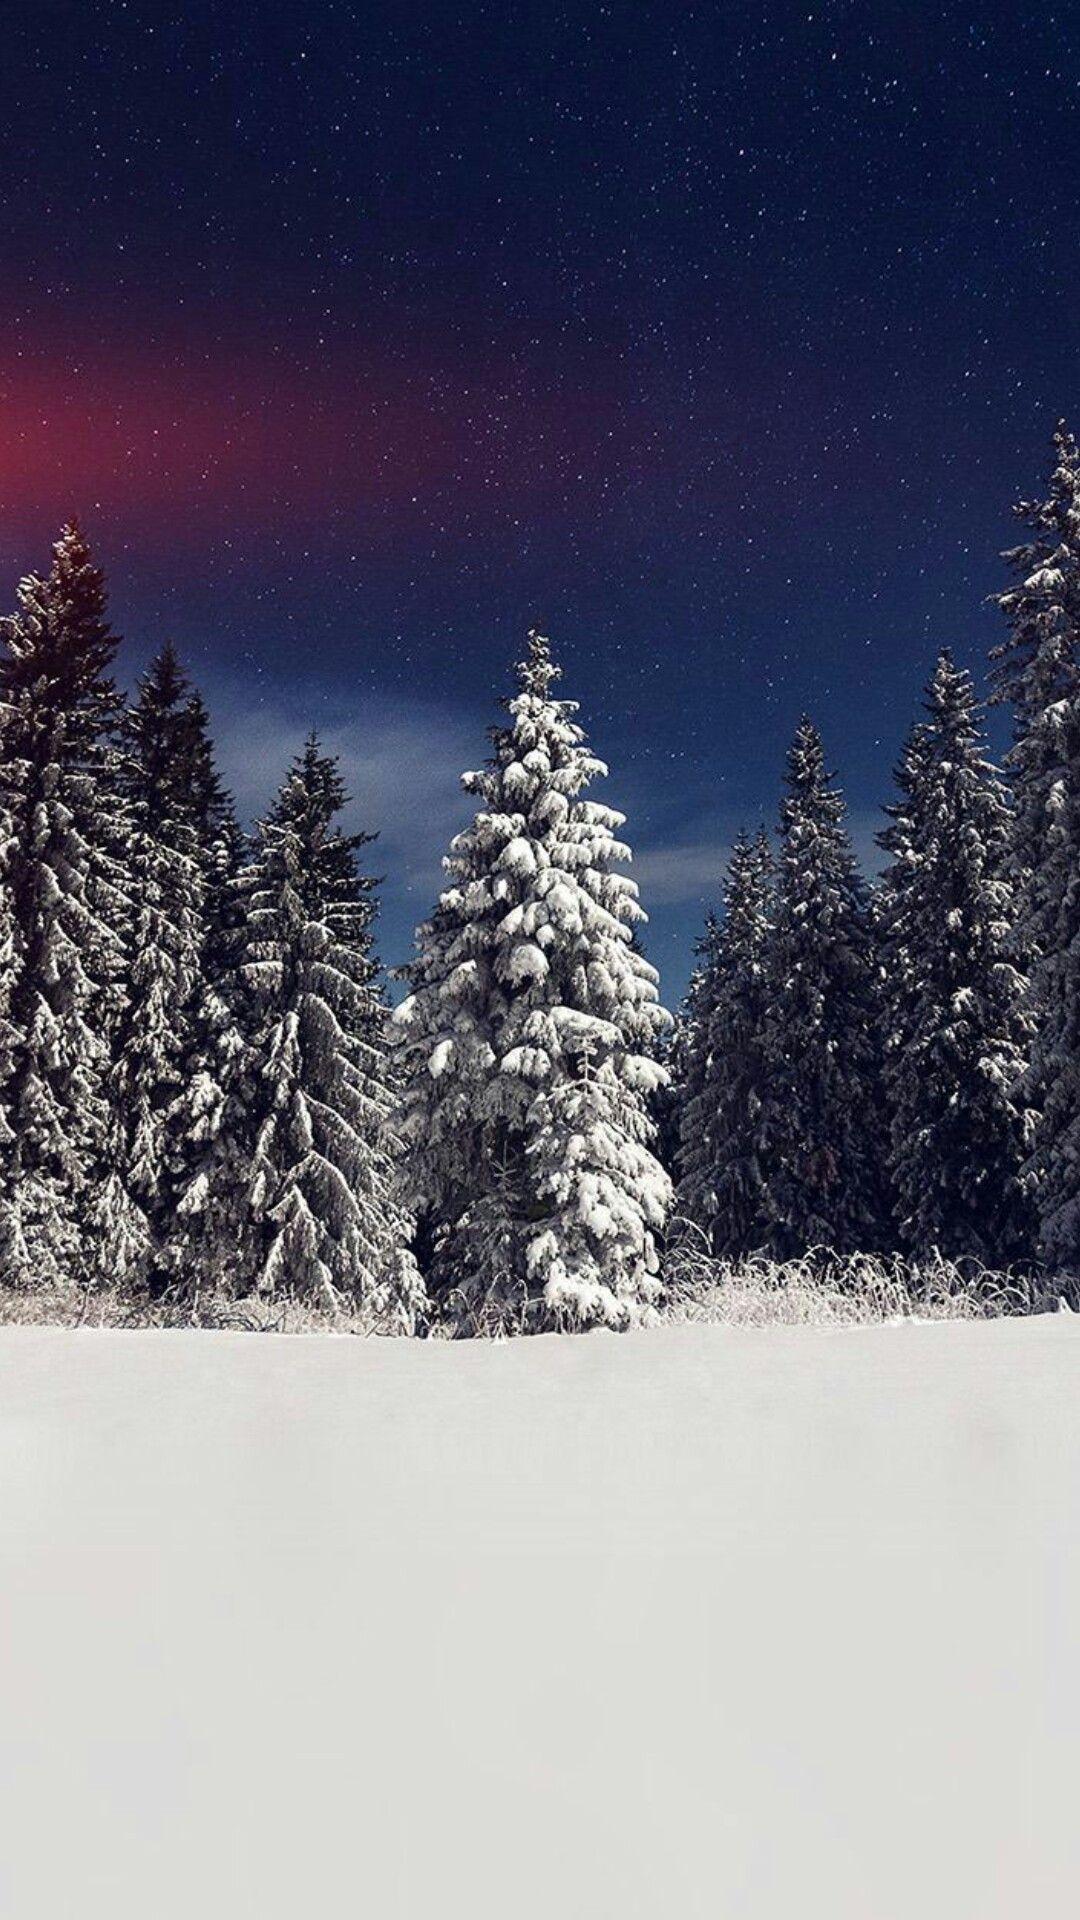 Pin By Katt Aspis On Samsung Galaxy 7 8 8 Iphone Wallpaper Winter Winter Wallpaper Winter Wood